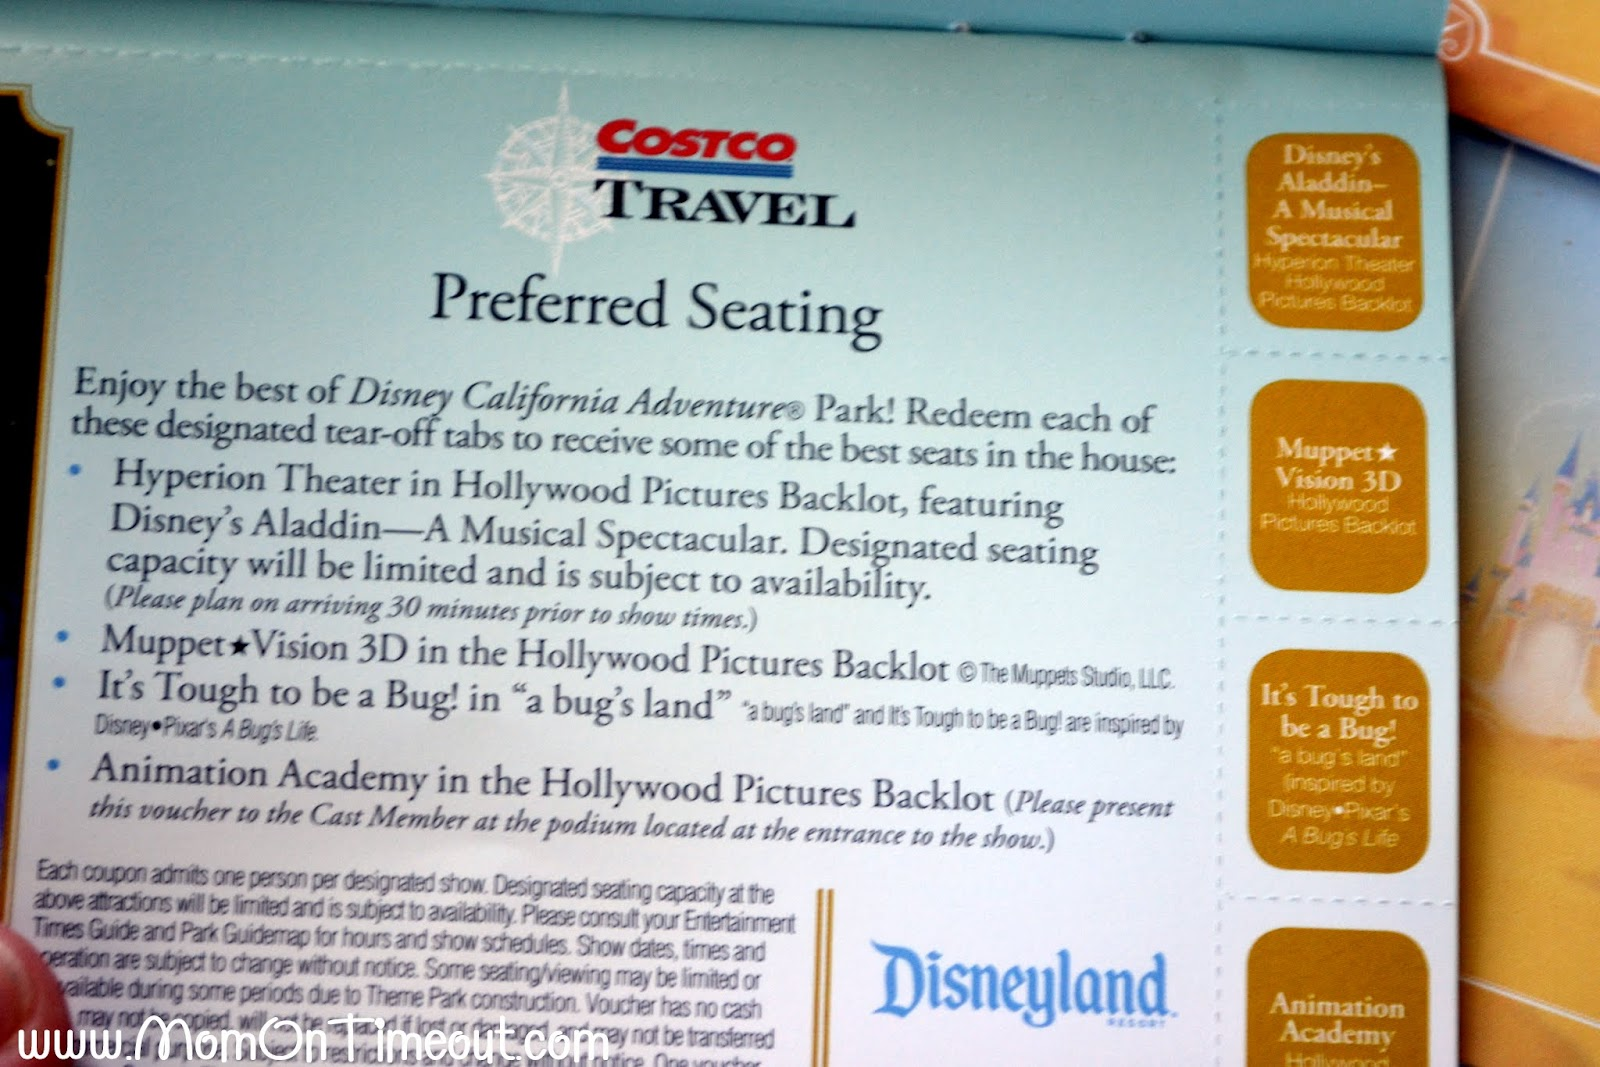 Disneyland discount coupons